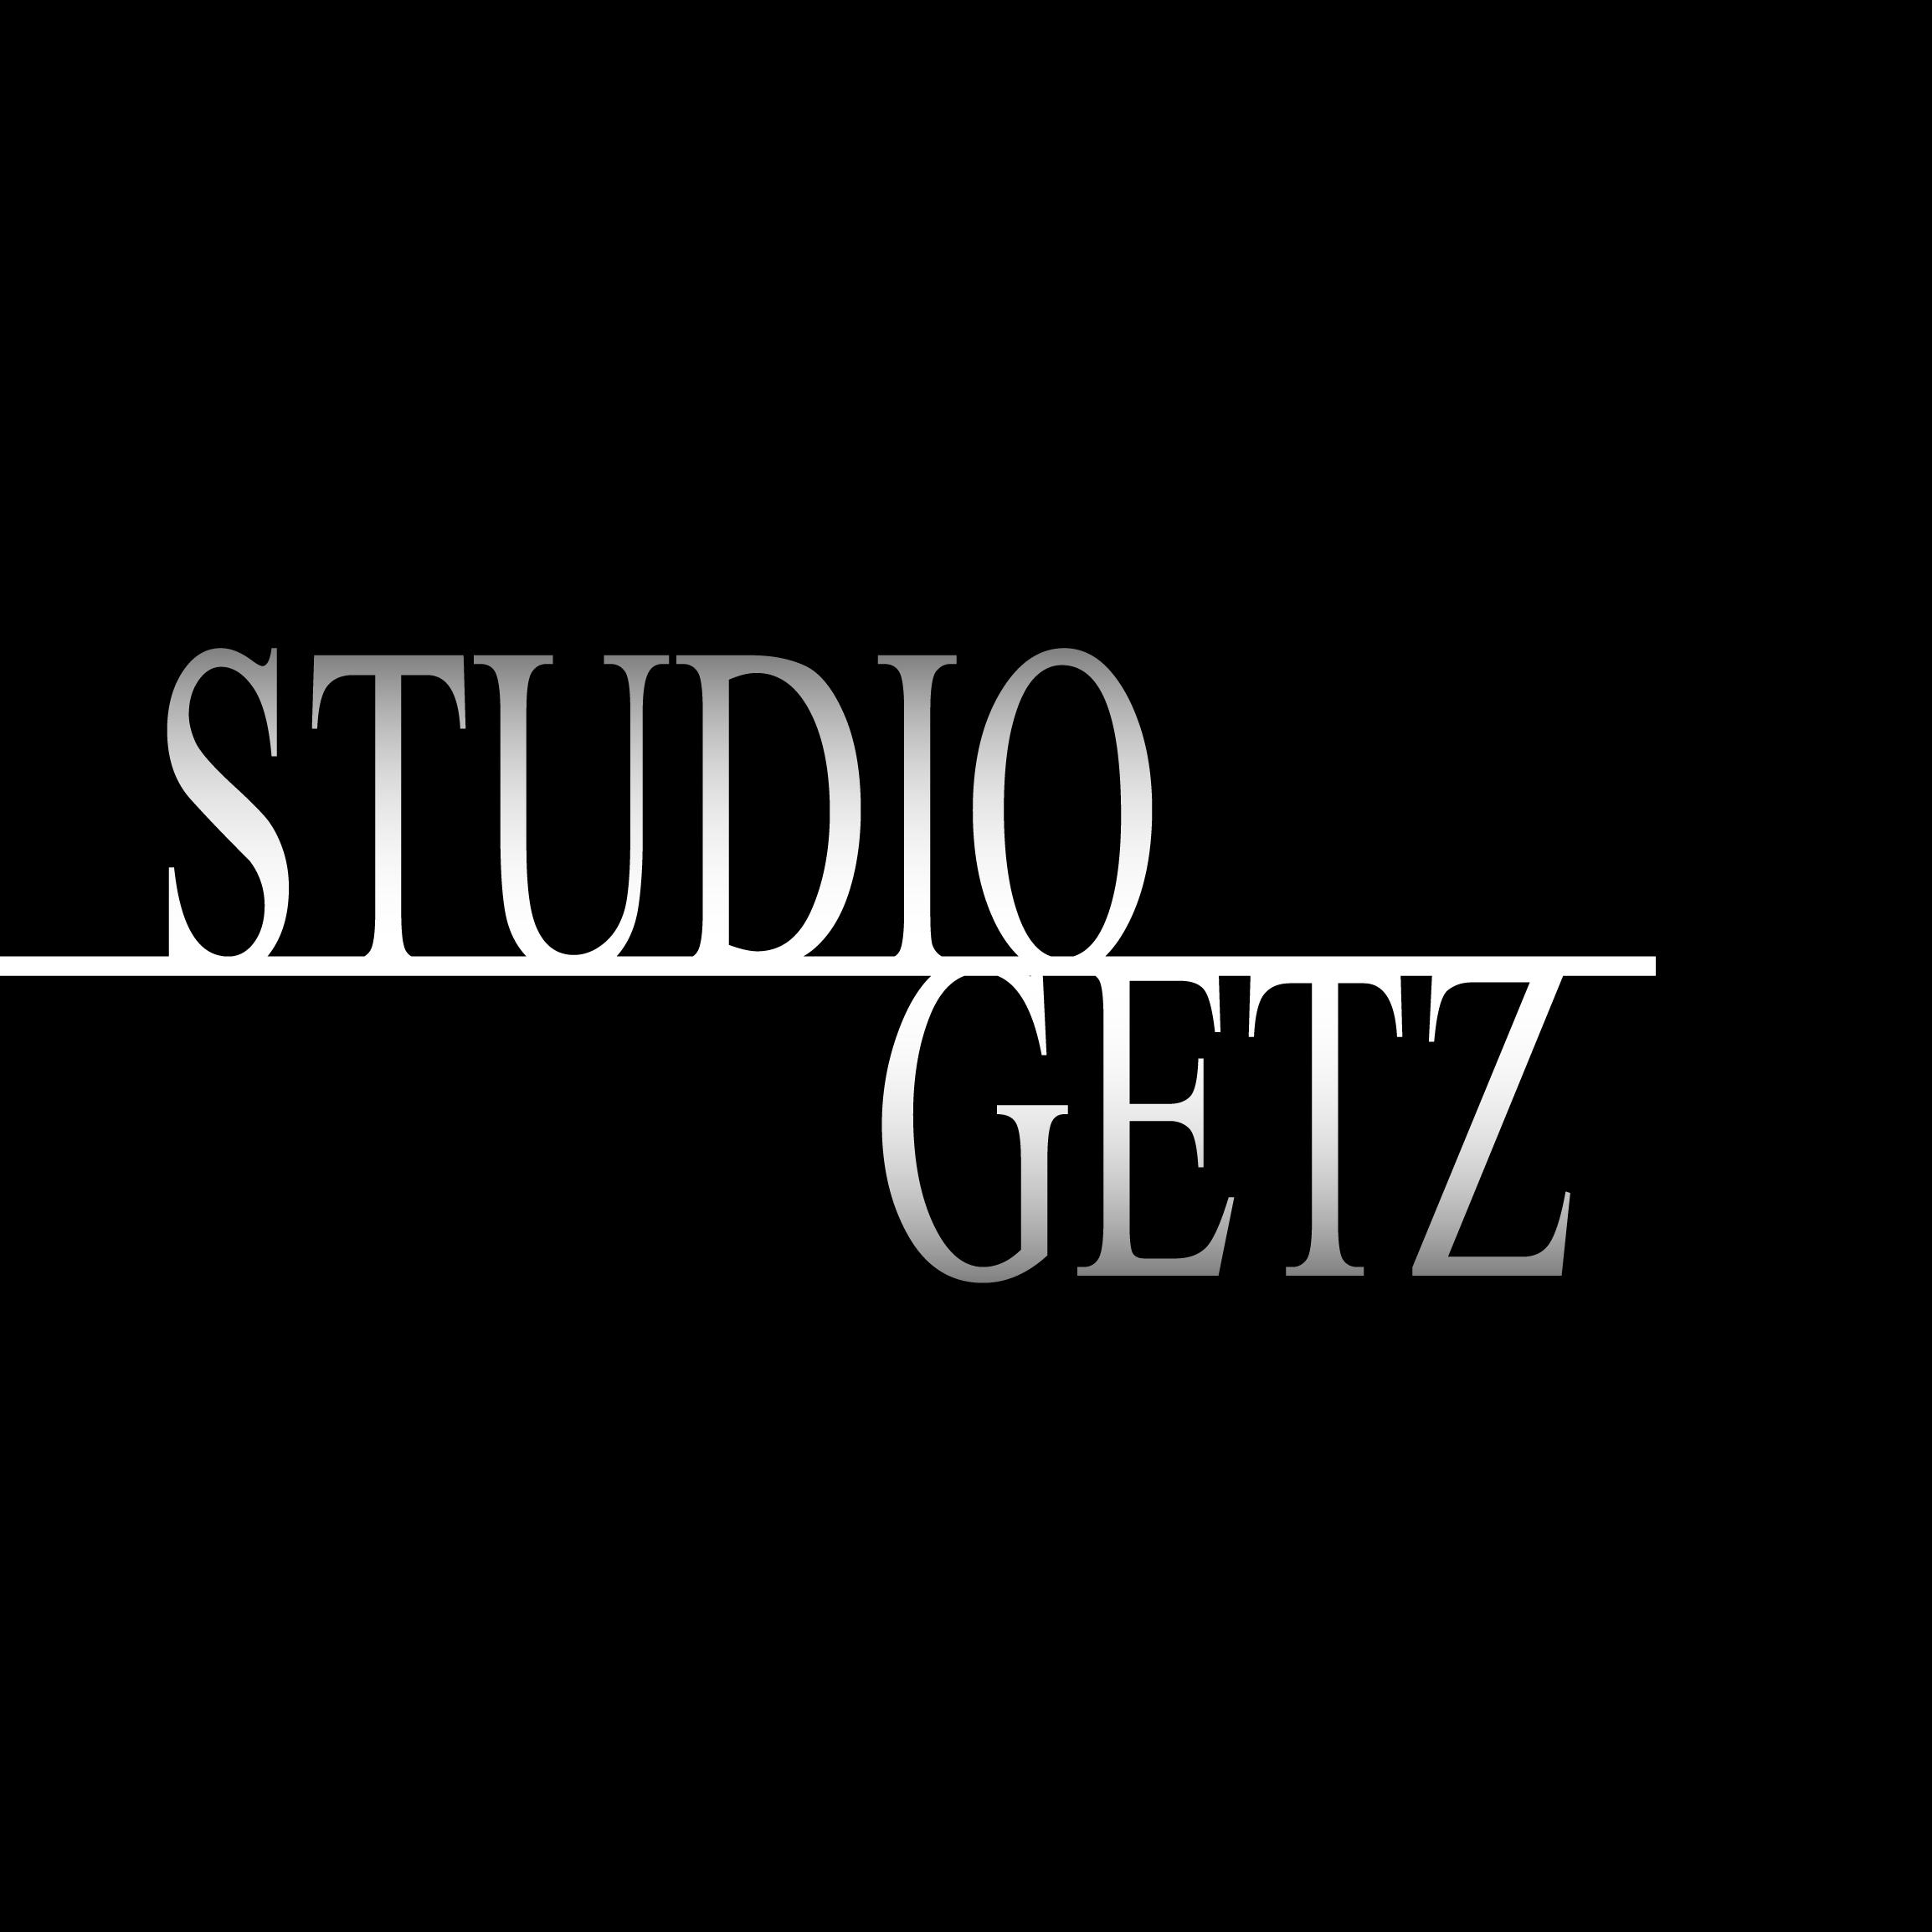 Logo designer | Studio Getz